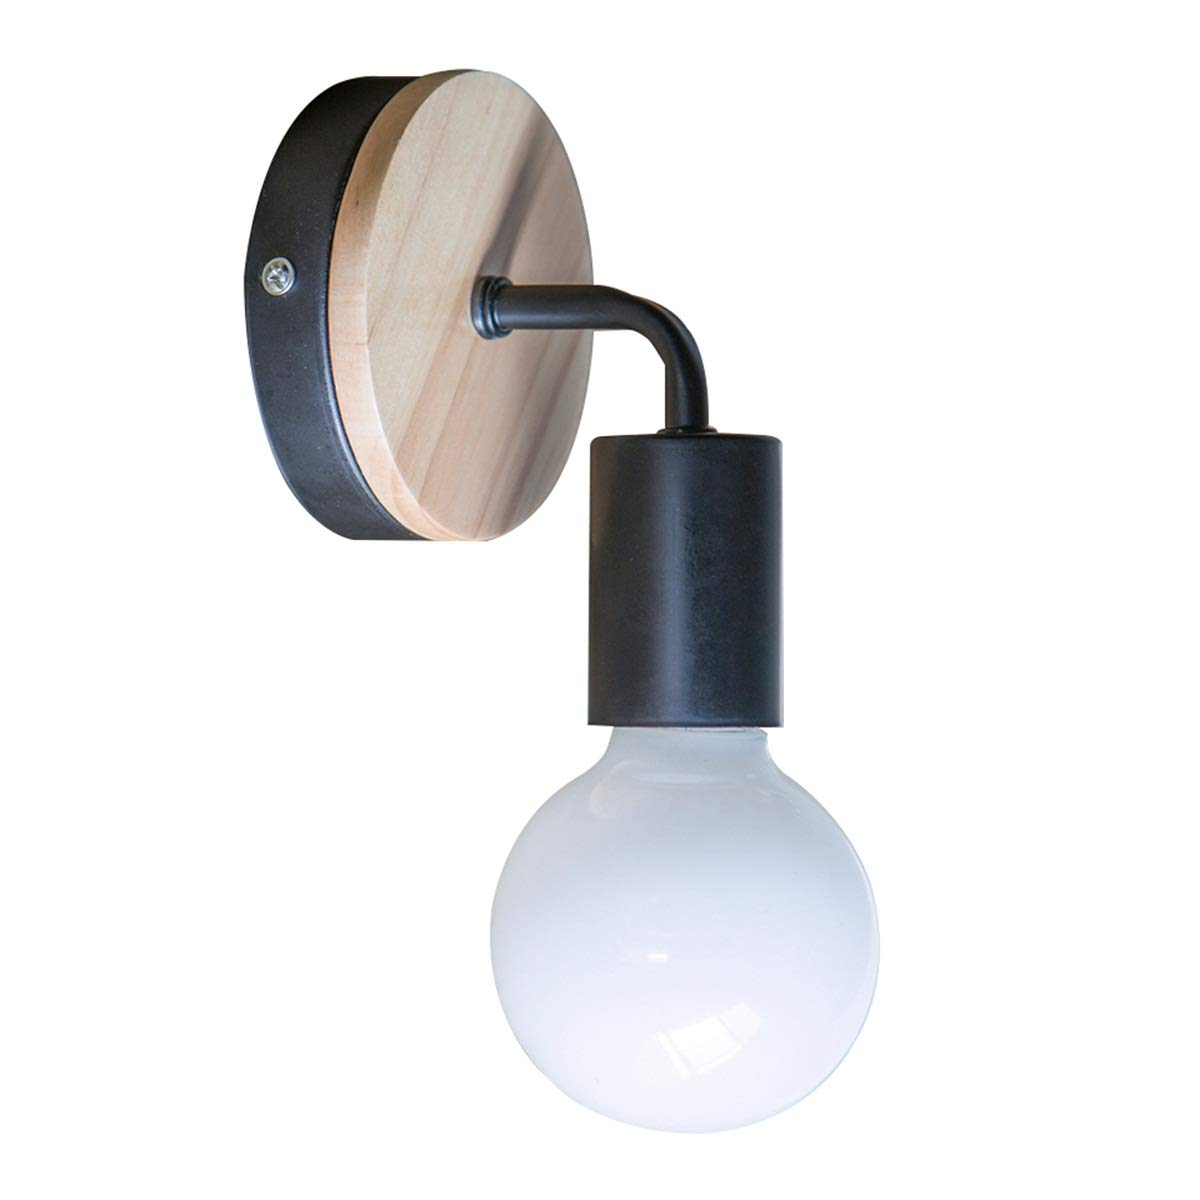 YUENSLIGHTING 2Pcs Lampada da parete in ferro battuto E27 40W Lampada da parete moderna in legno da parete Lampada da letto di lettura leggera per la camera da letto vivente (nessuna lampadina)